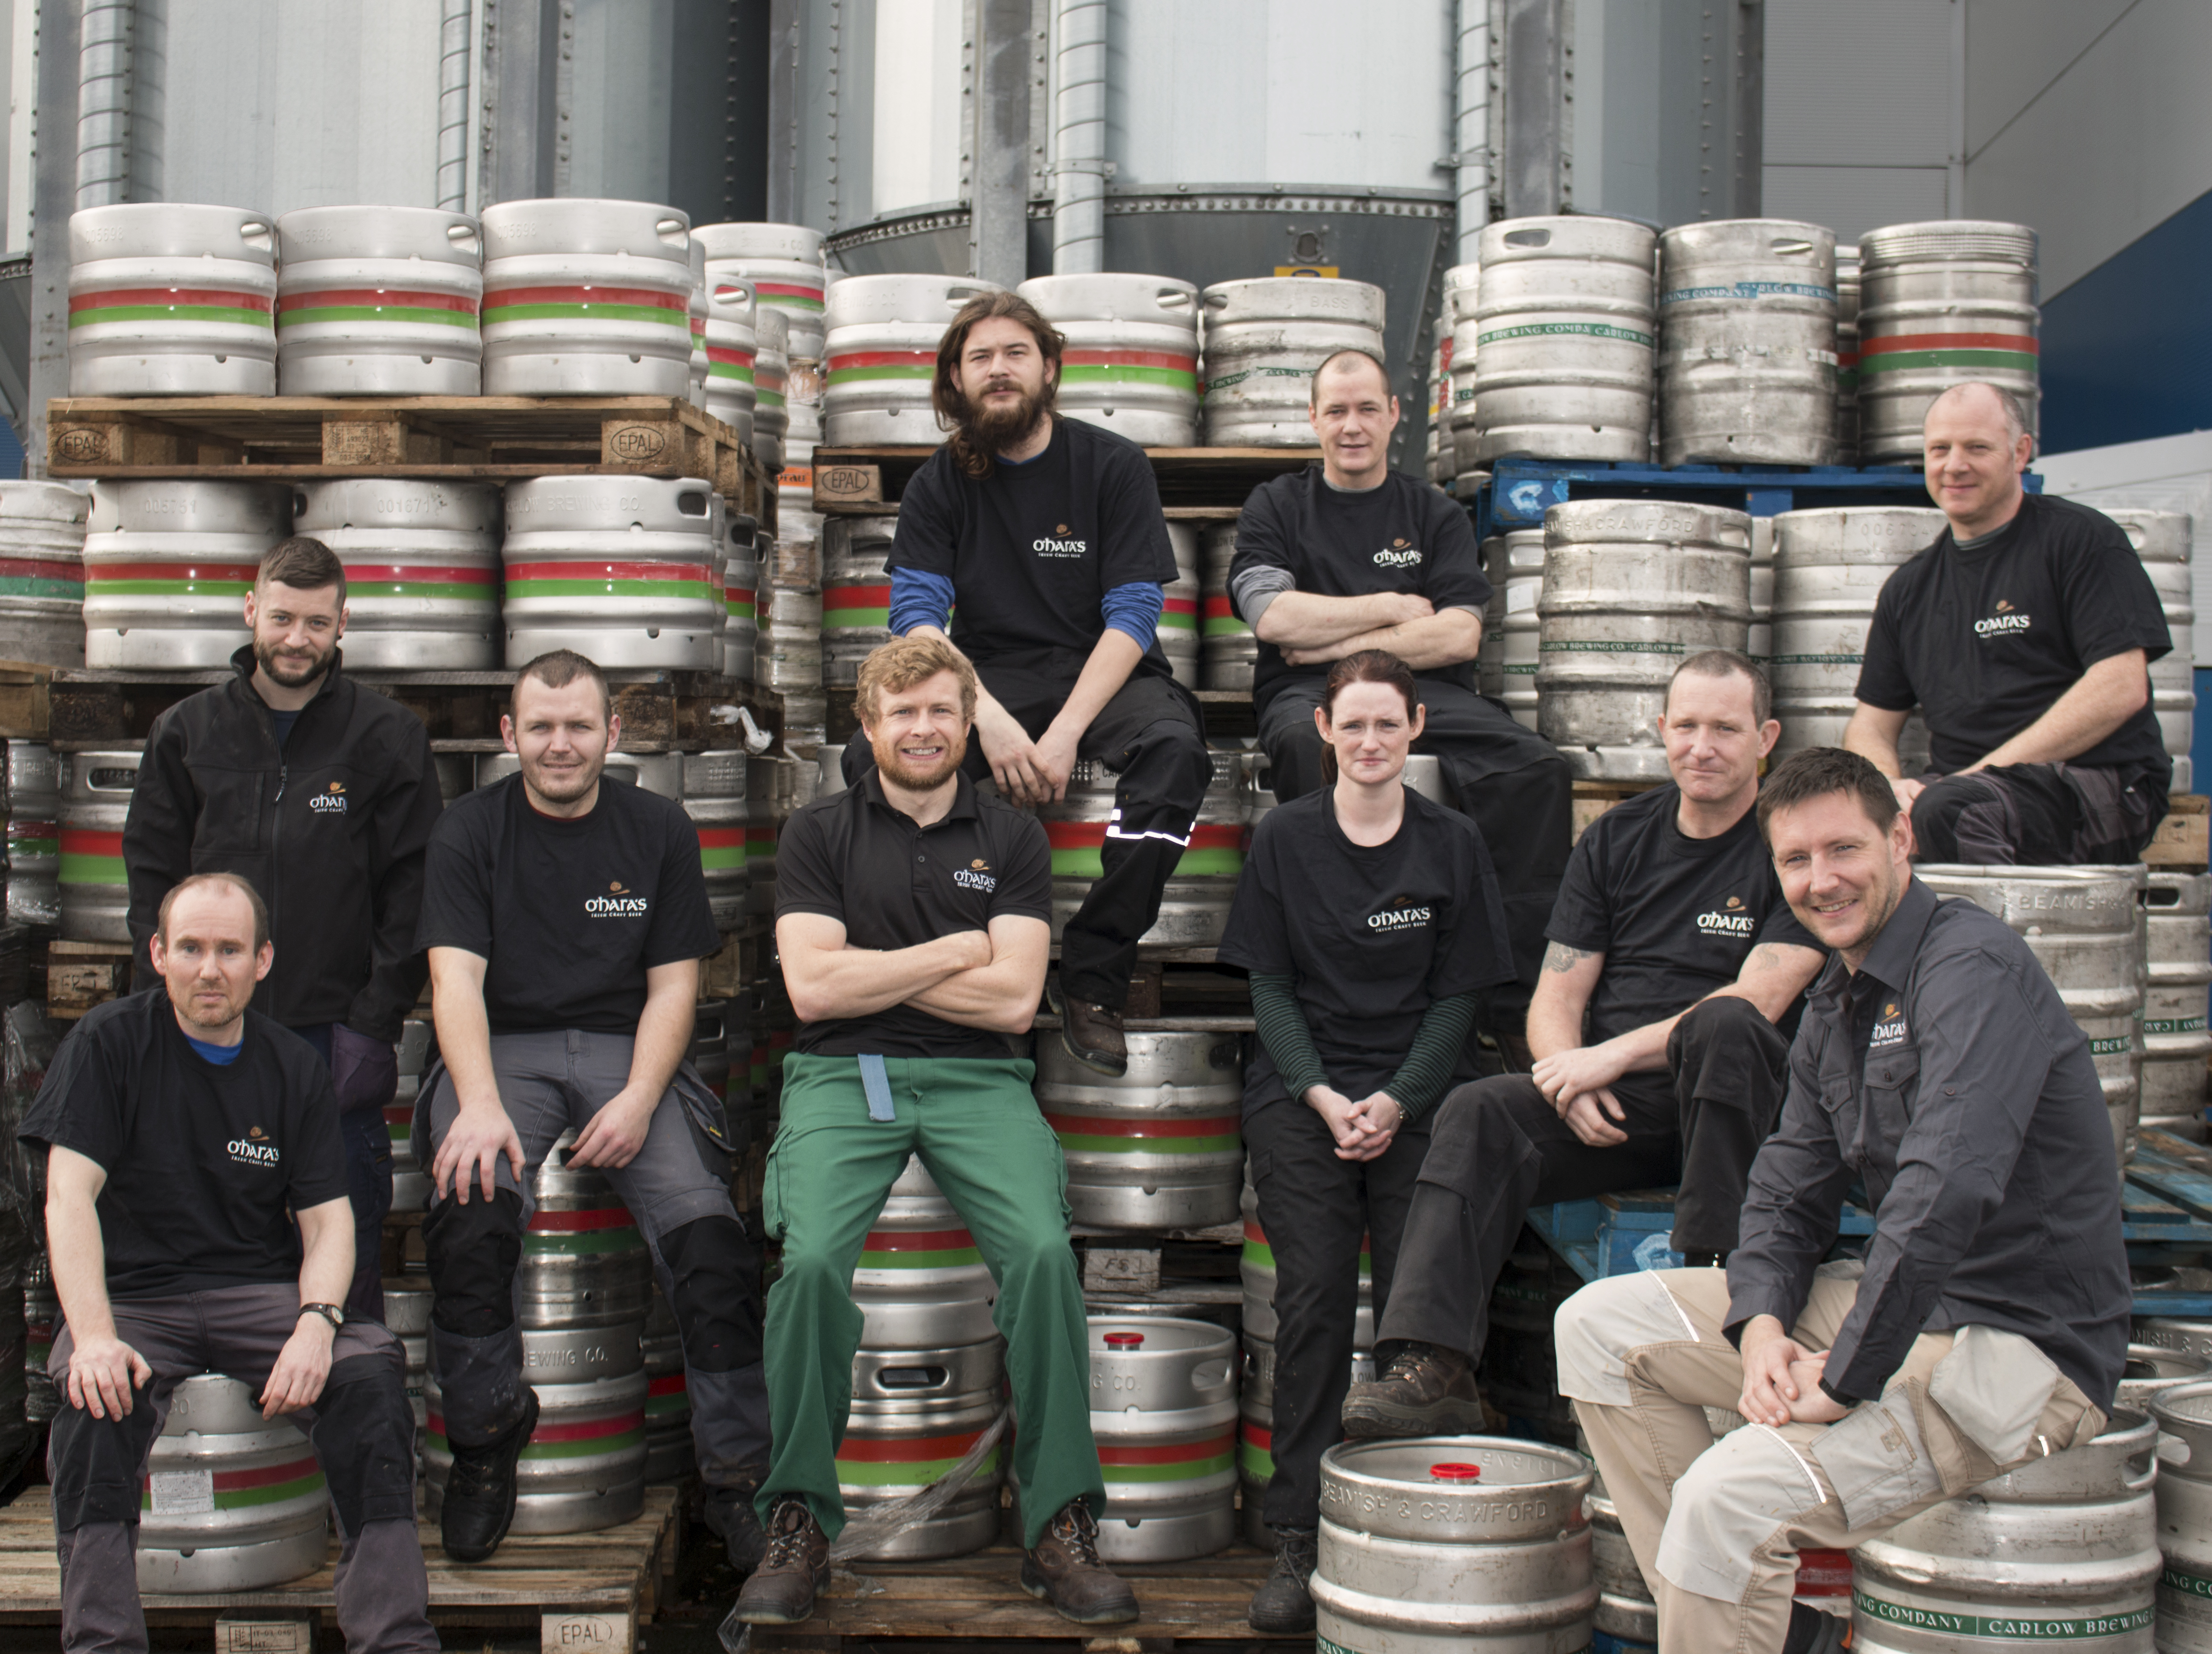 Brewing-team-photo